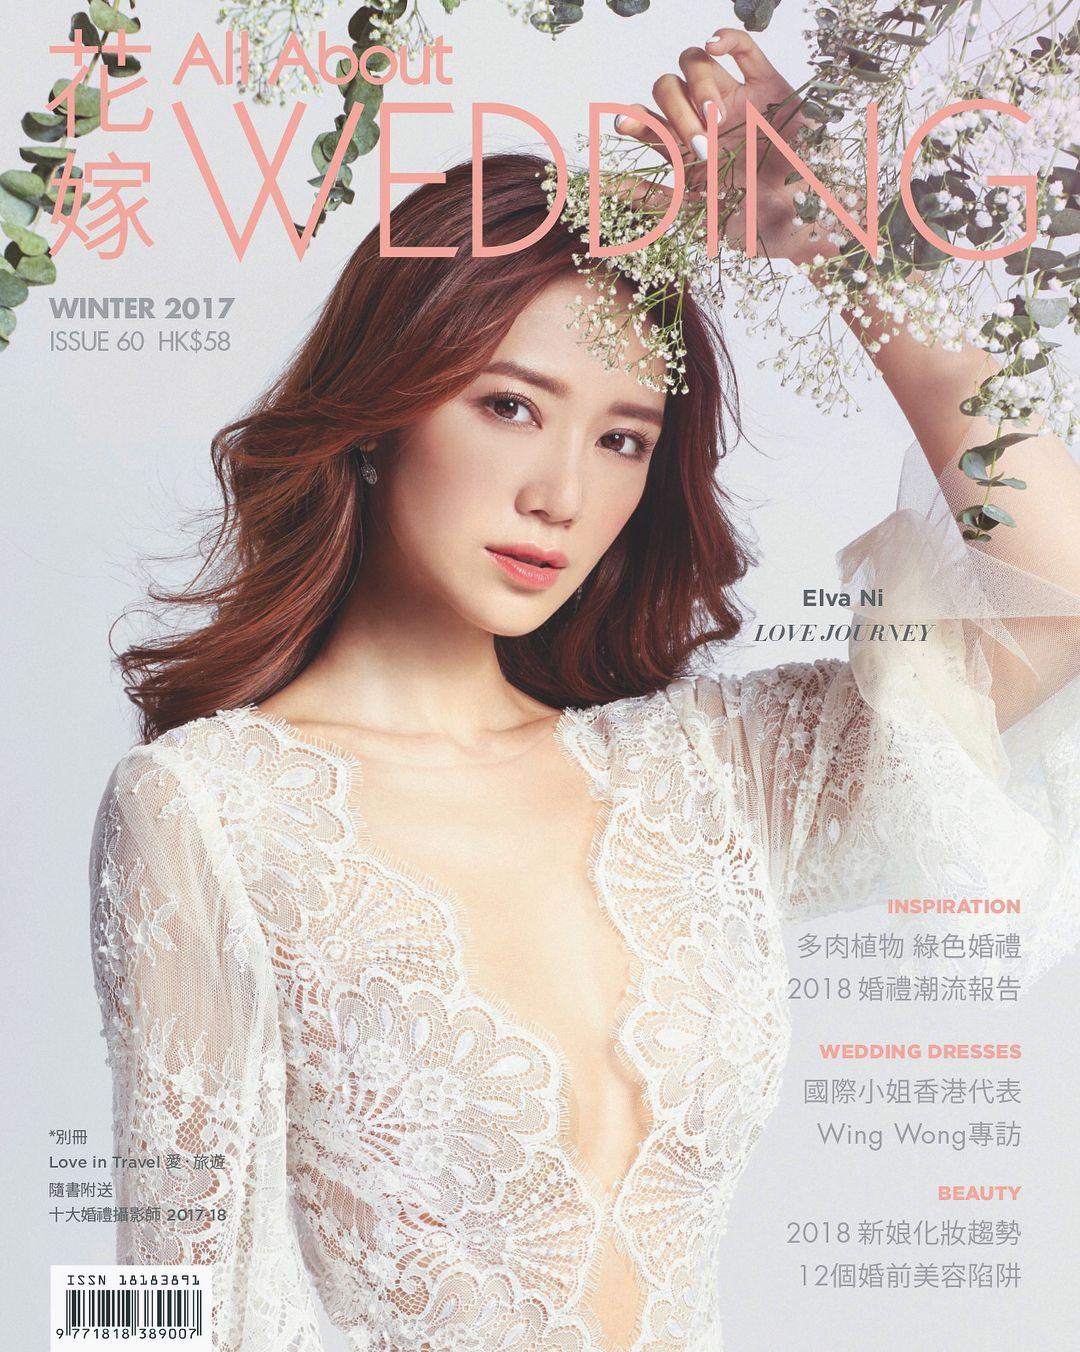 5 138 Likes 31 Comments Elva Ni 倪晨曦 Misselvani On Instagram What Is Your Dream Wedding Dress 我的答案也很模糊 應該說還沒有遇到吧 做model穿婚紗